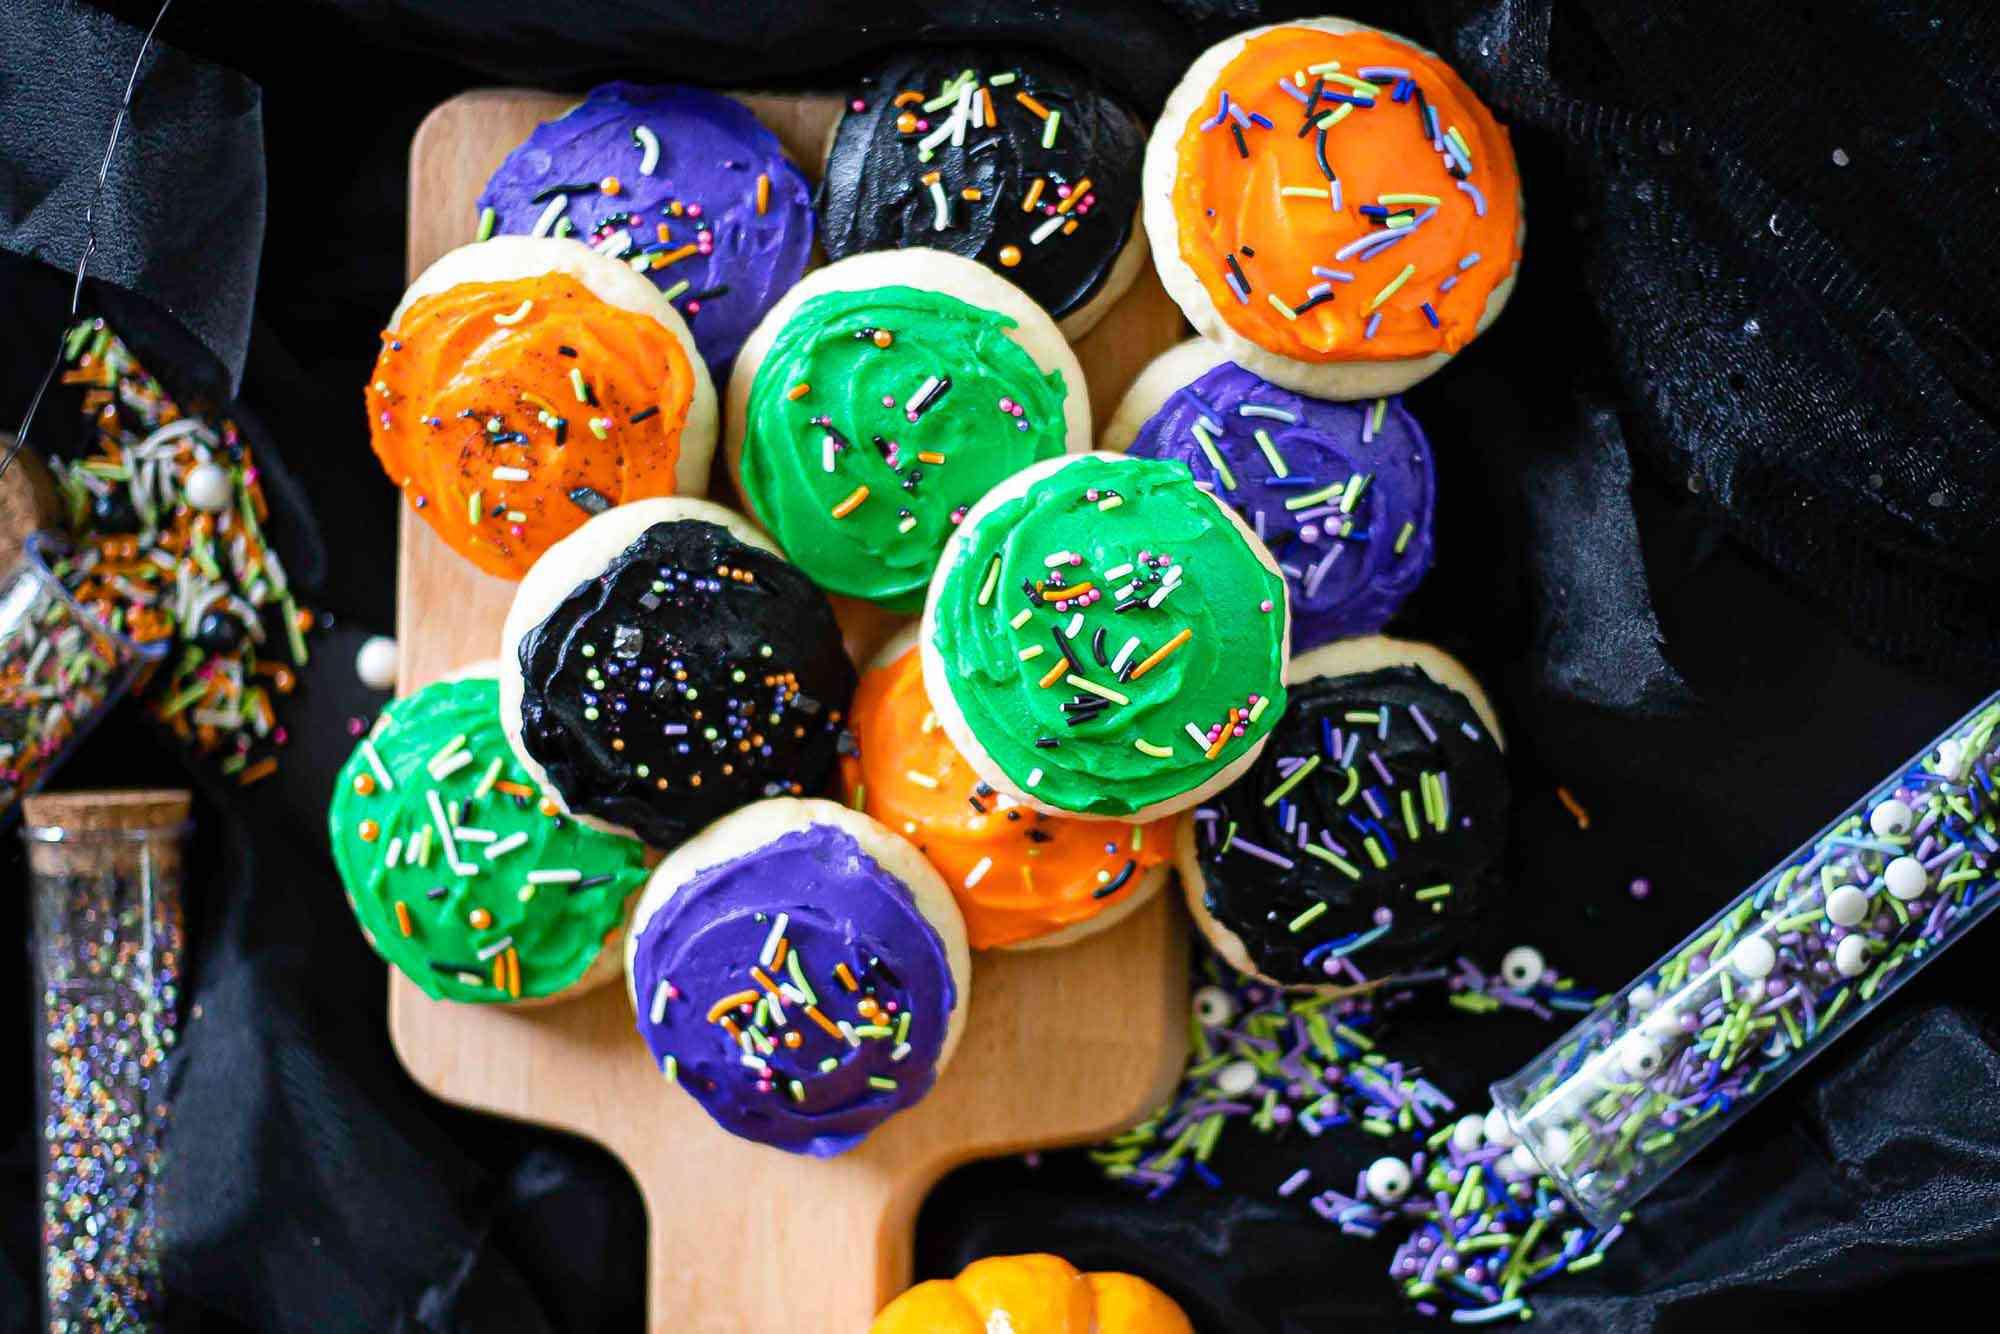 Lofthouse-style spooky sugar cookies